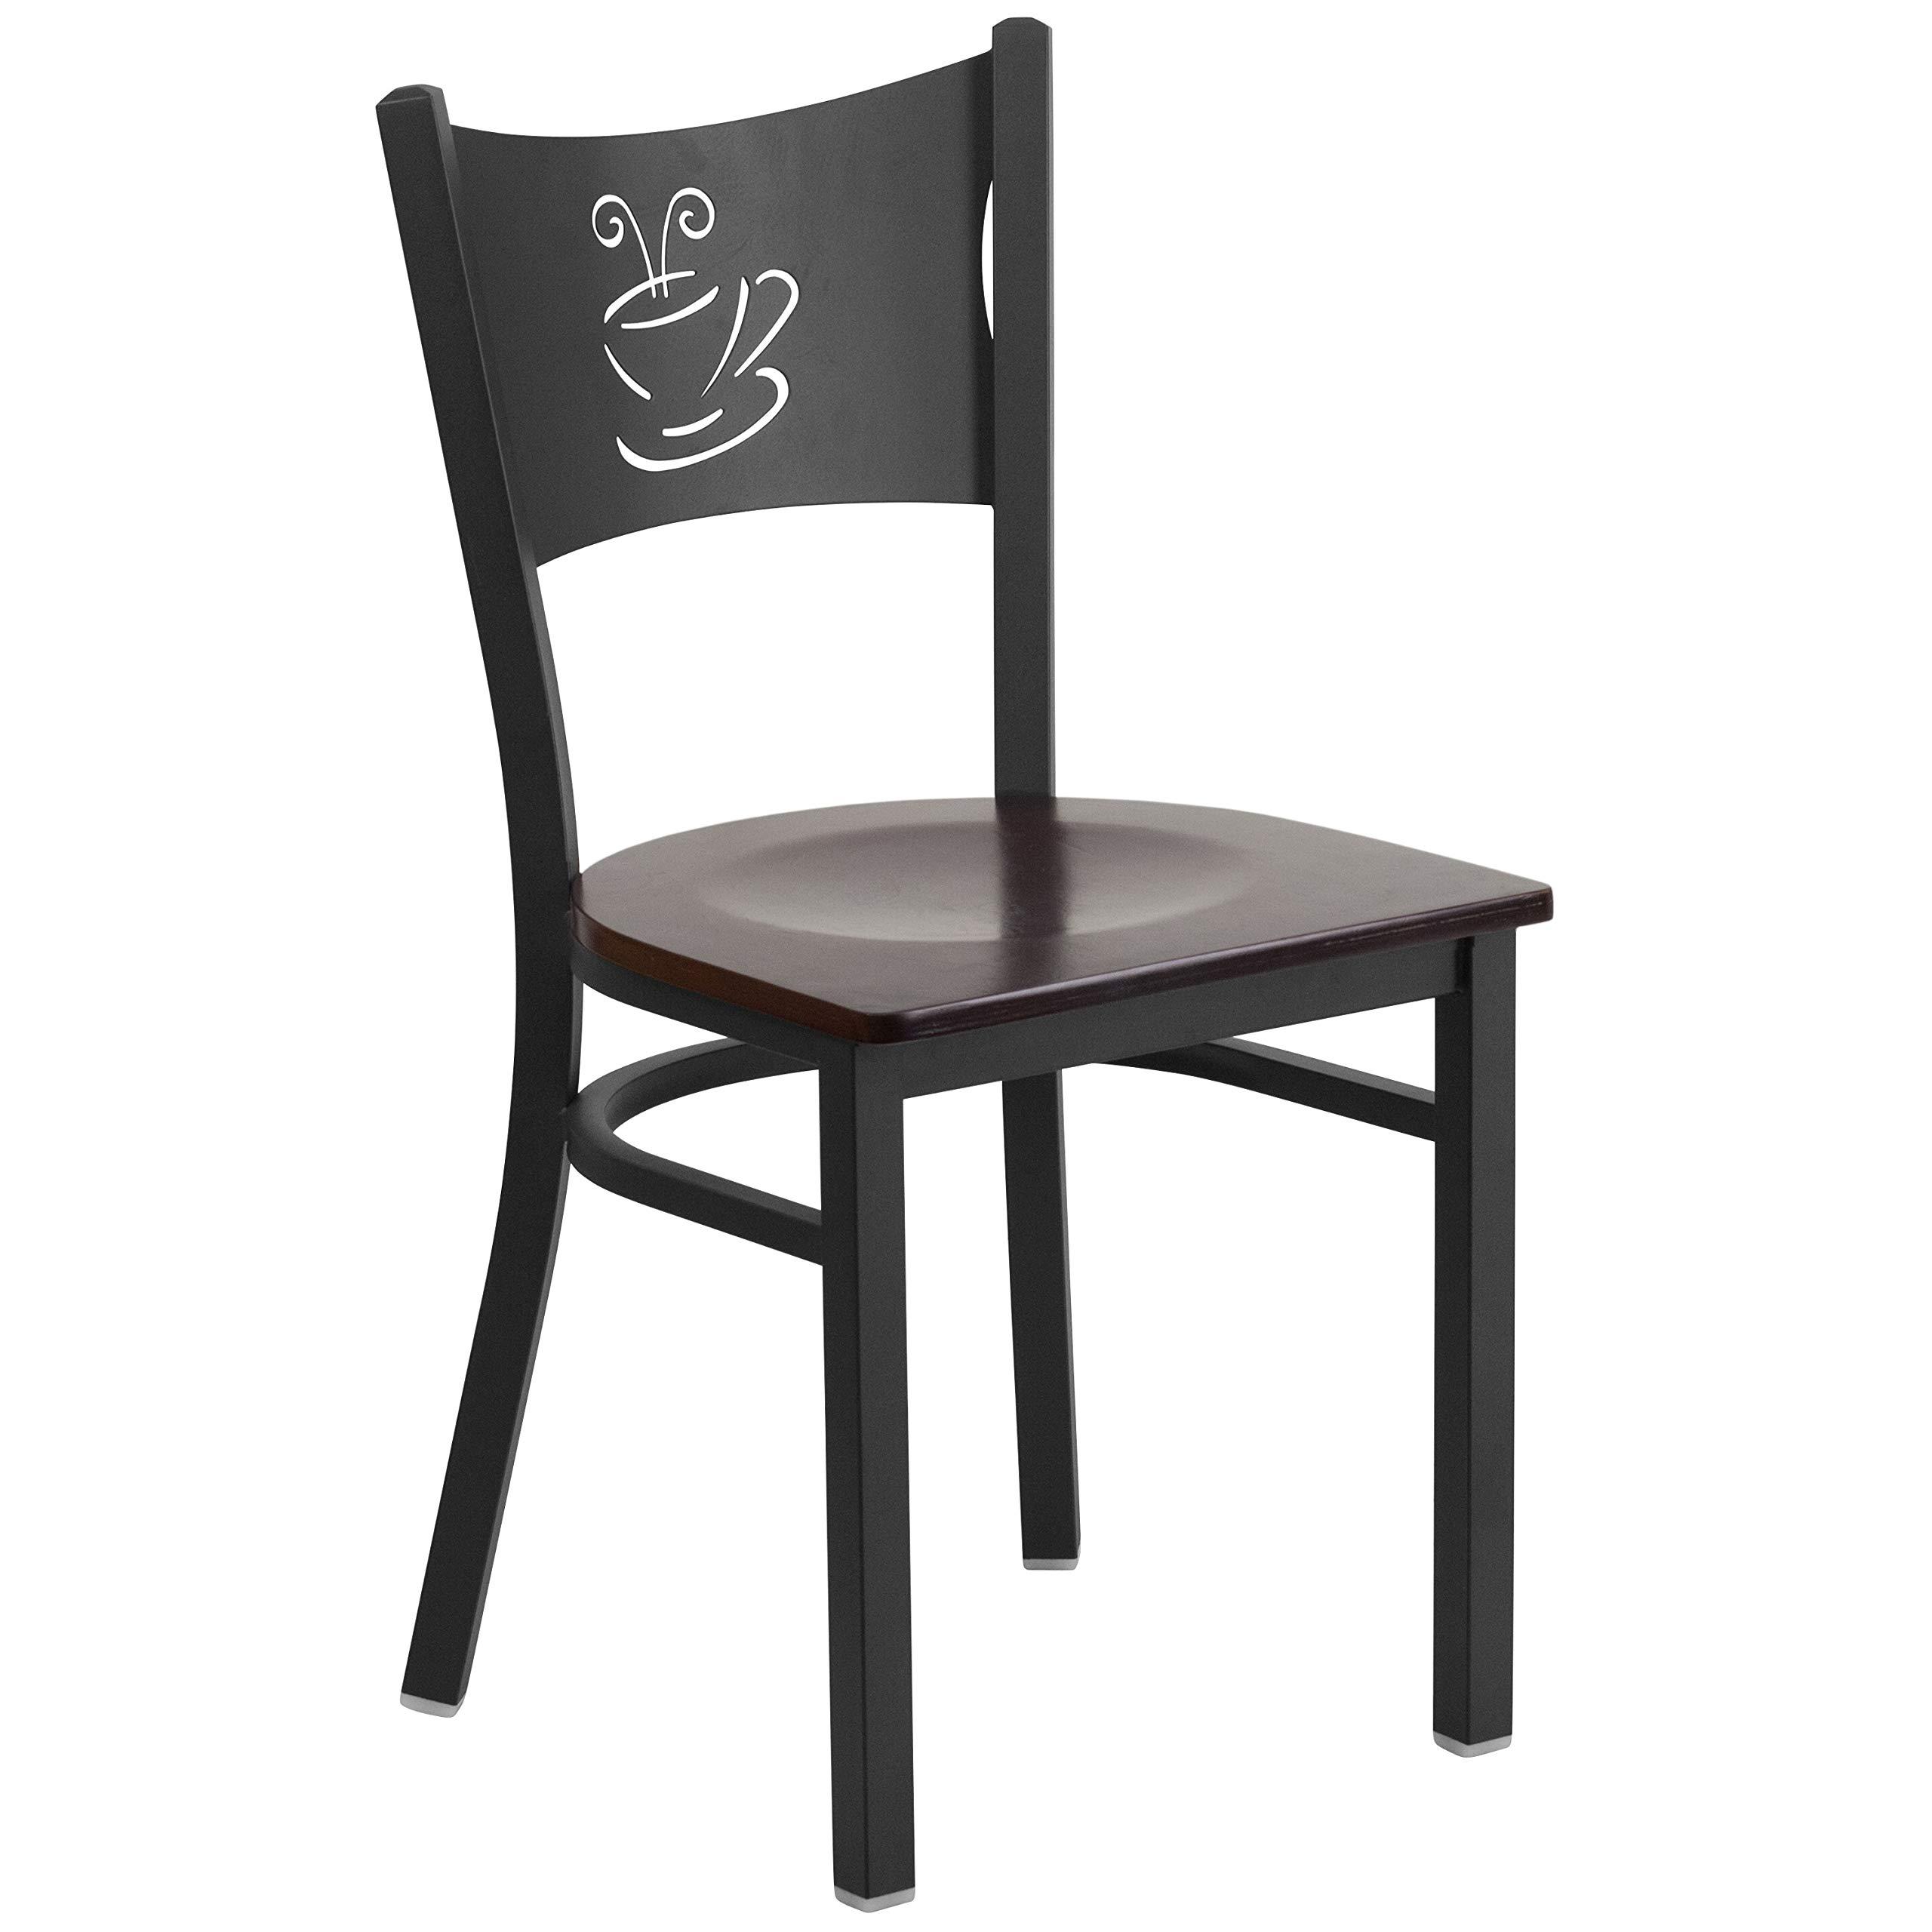 MFO Princeton Collection Black Coffee Back Metal Restaurant Chair - Walnut Wood Seat